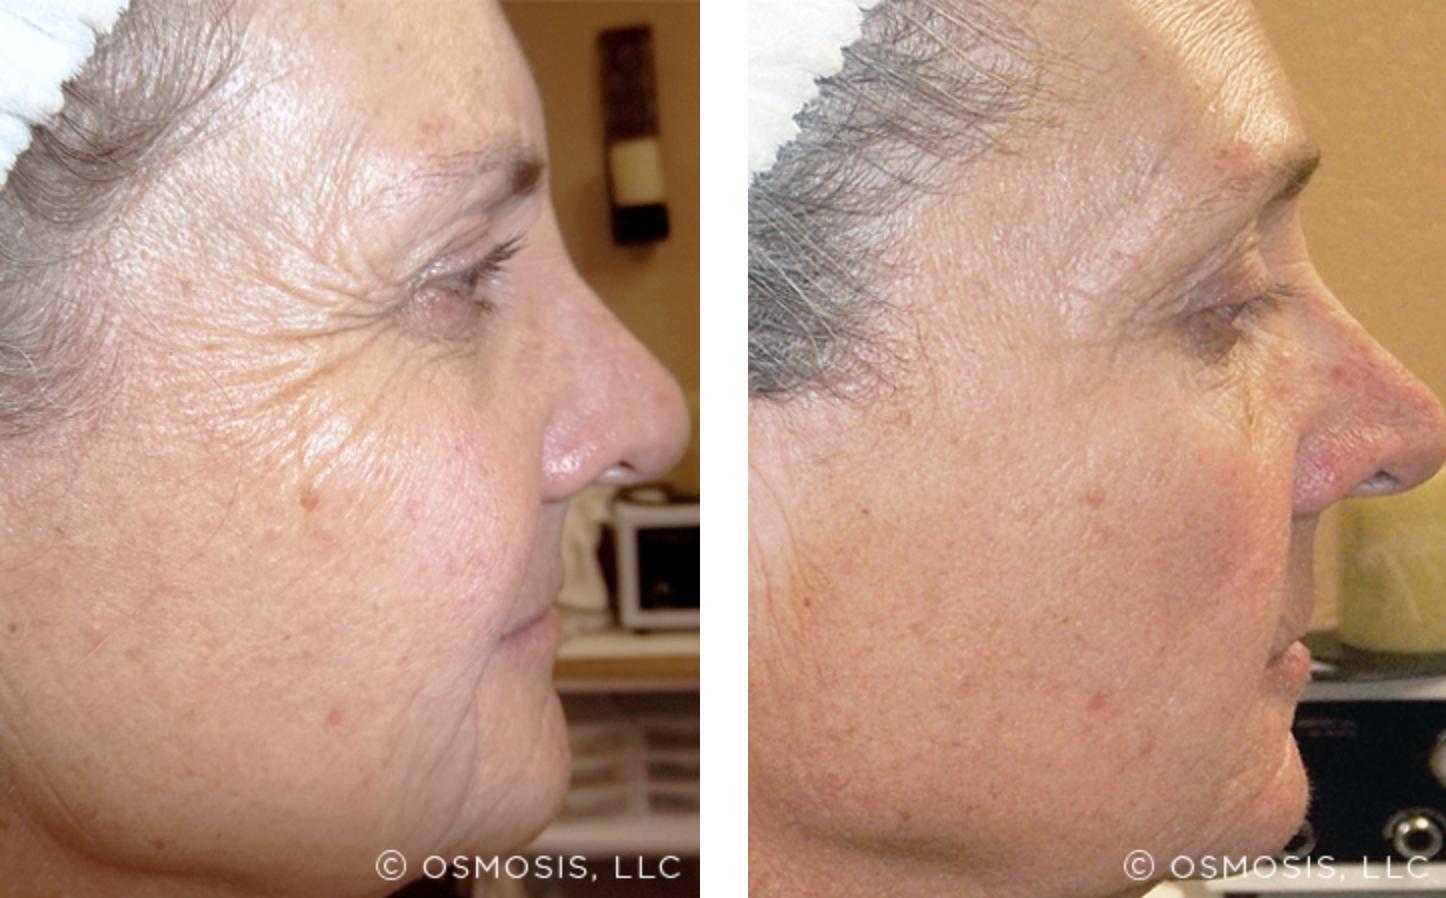 Osmosis - Wrinkles